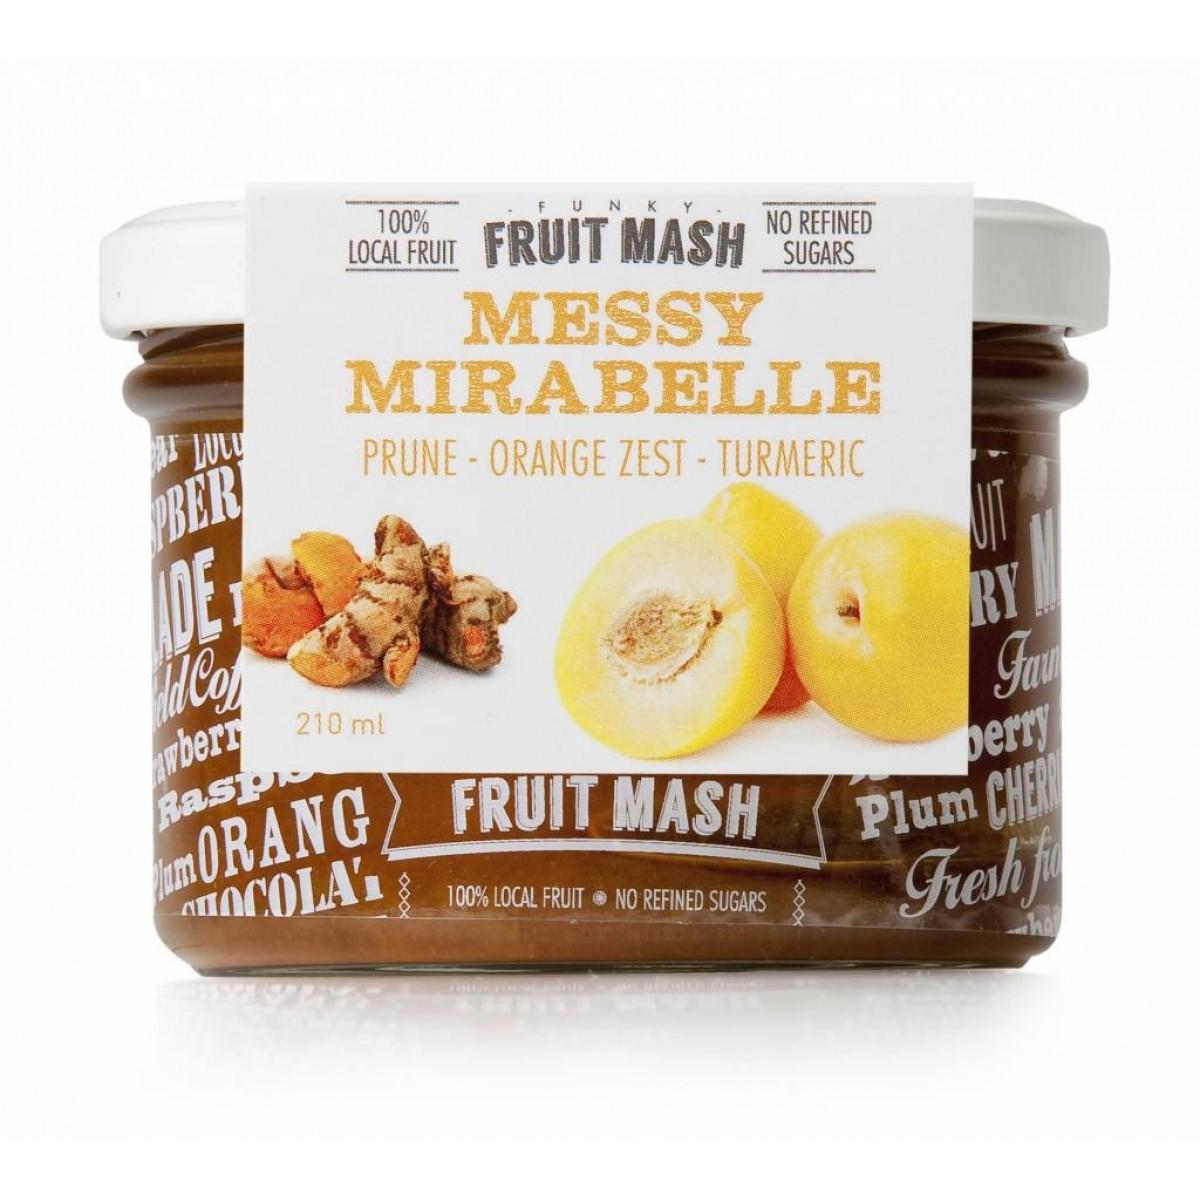 Funky Fruit Mash Messy Mirabelle